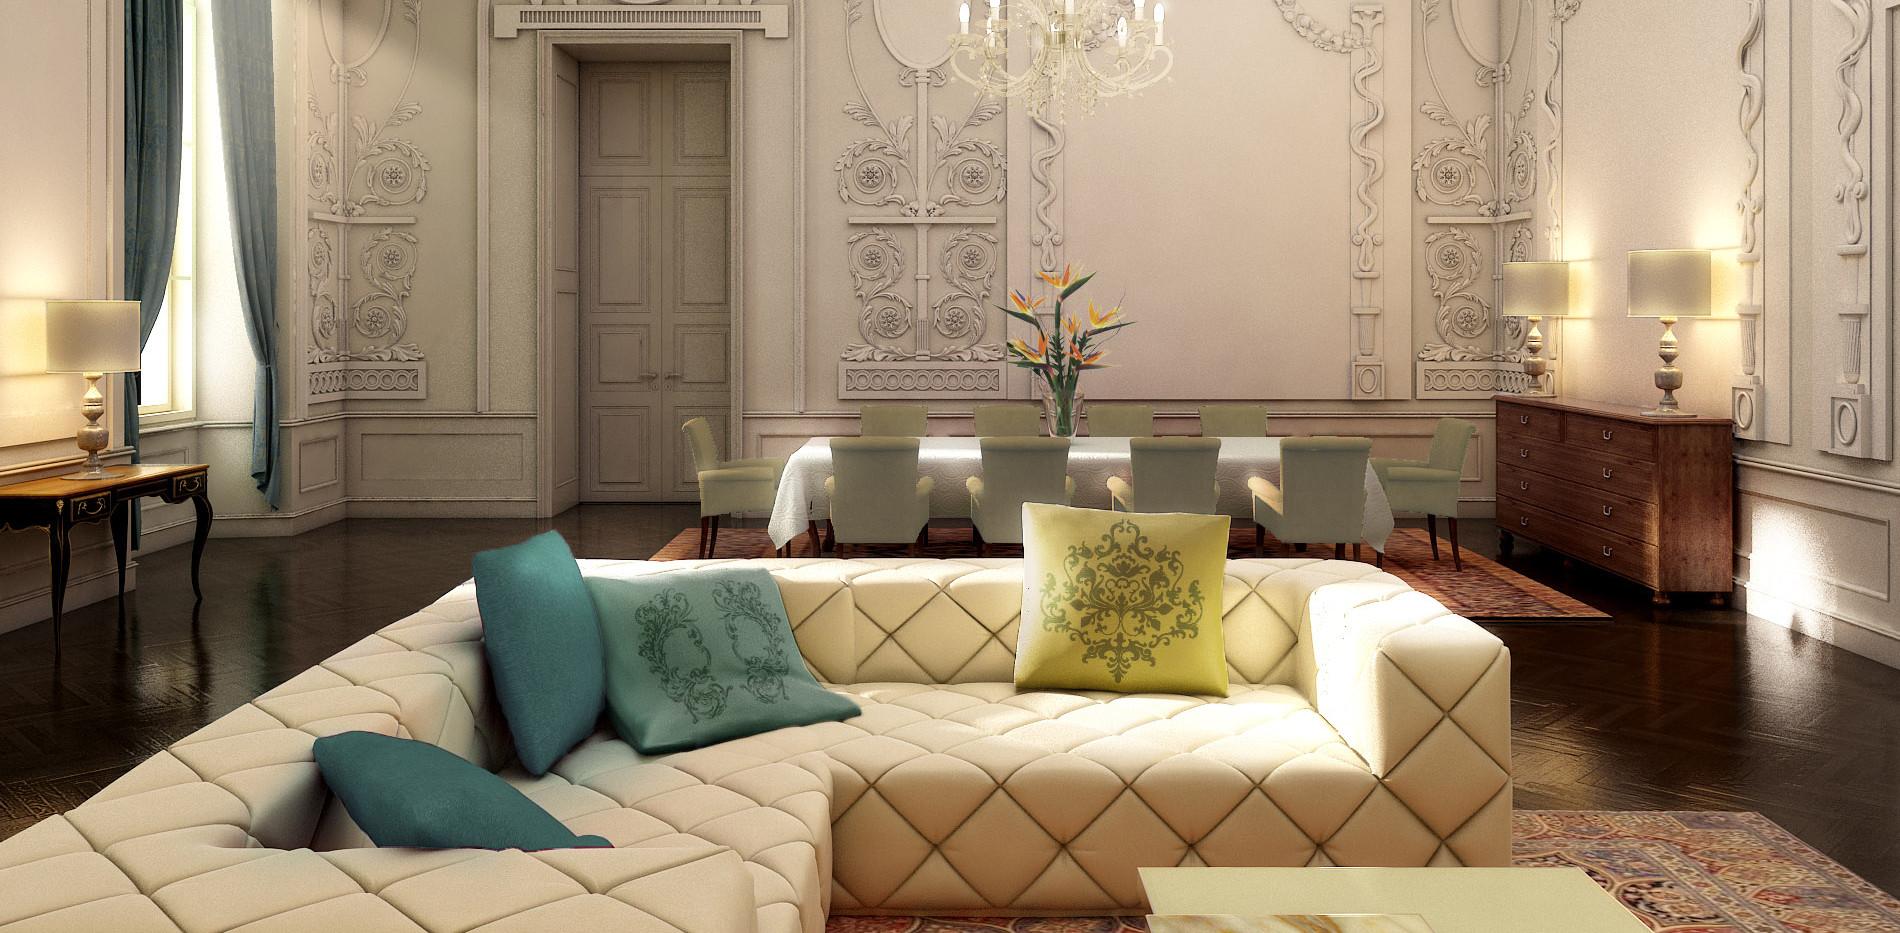 015-Hogyesz-Kastely-Demeter-Design-Studi